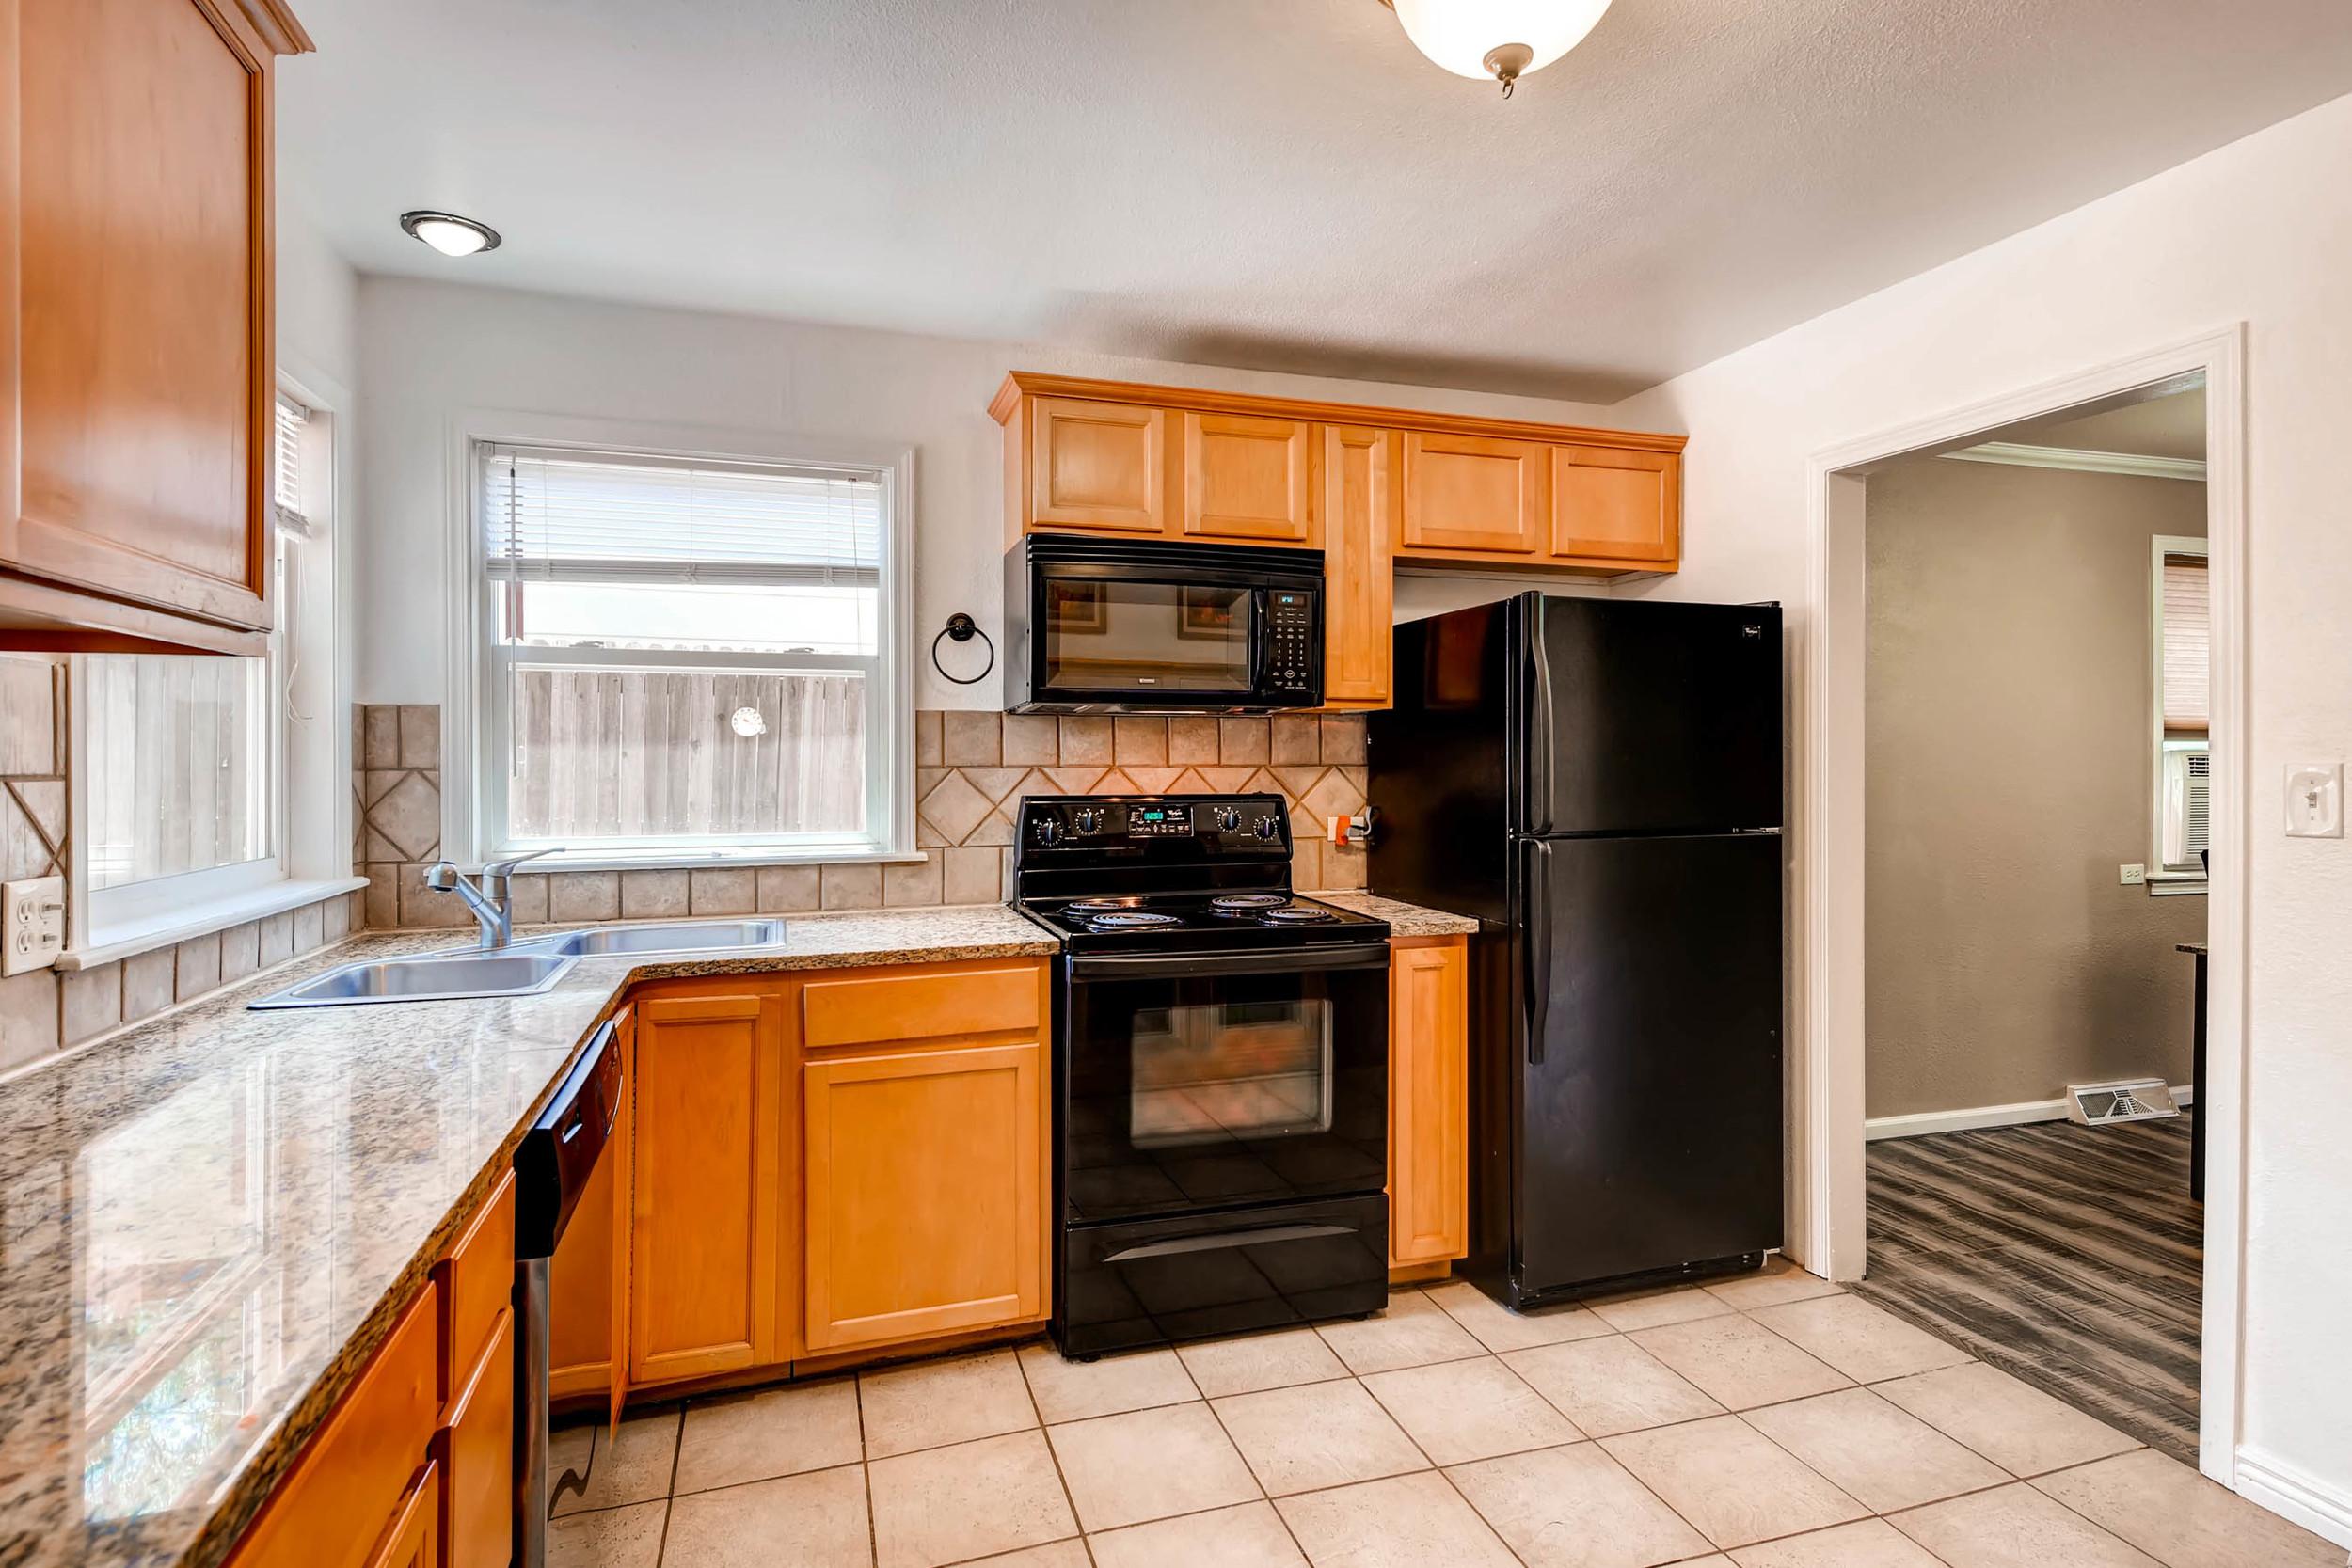 4224 S Cherokee St Englewood-print-011-7-Kitchen-2700x1800-300dpi.jpg